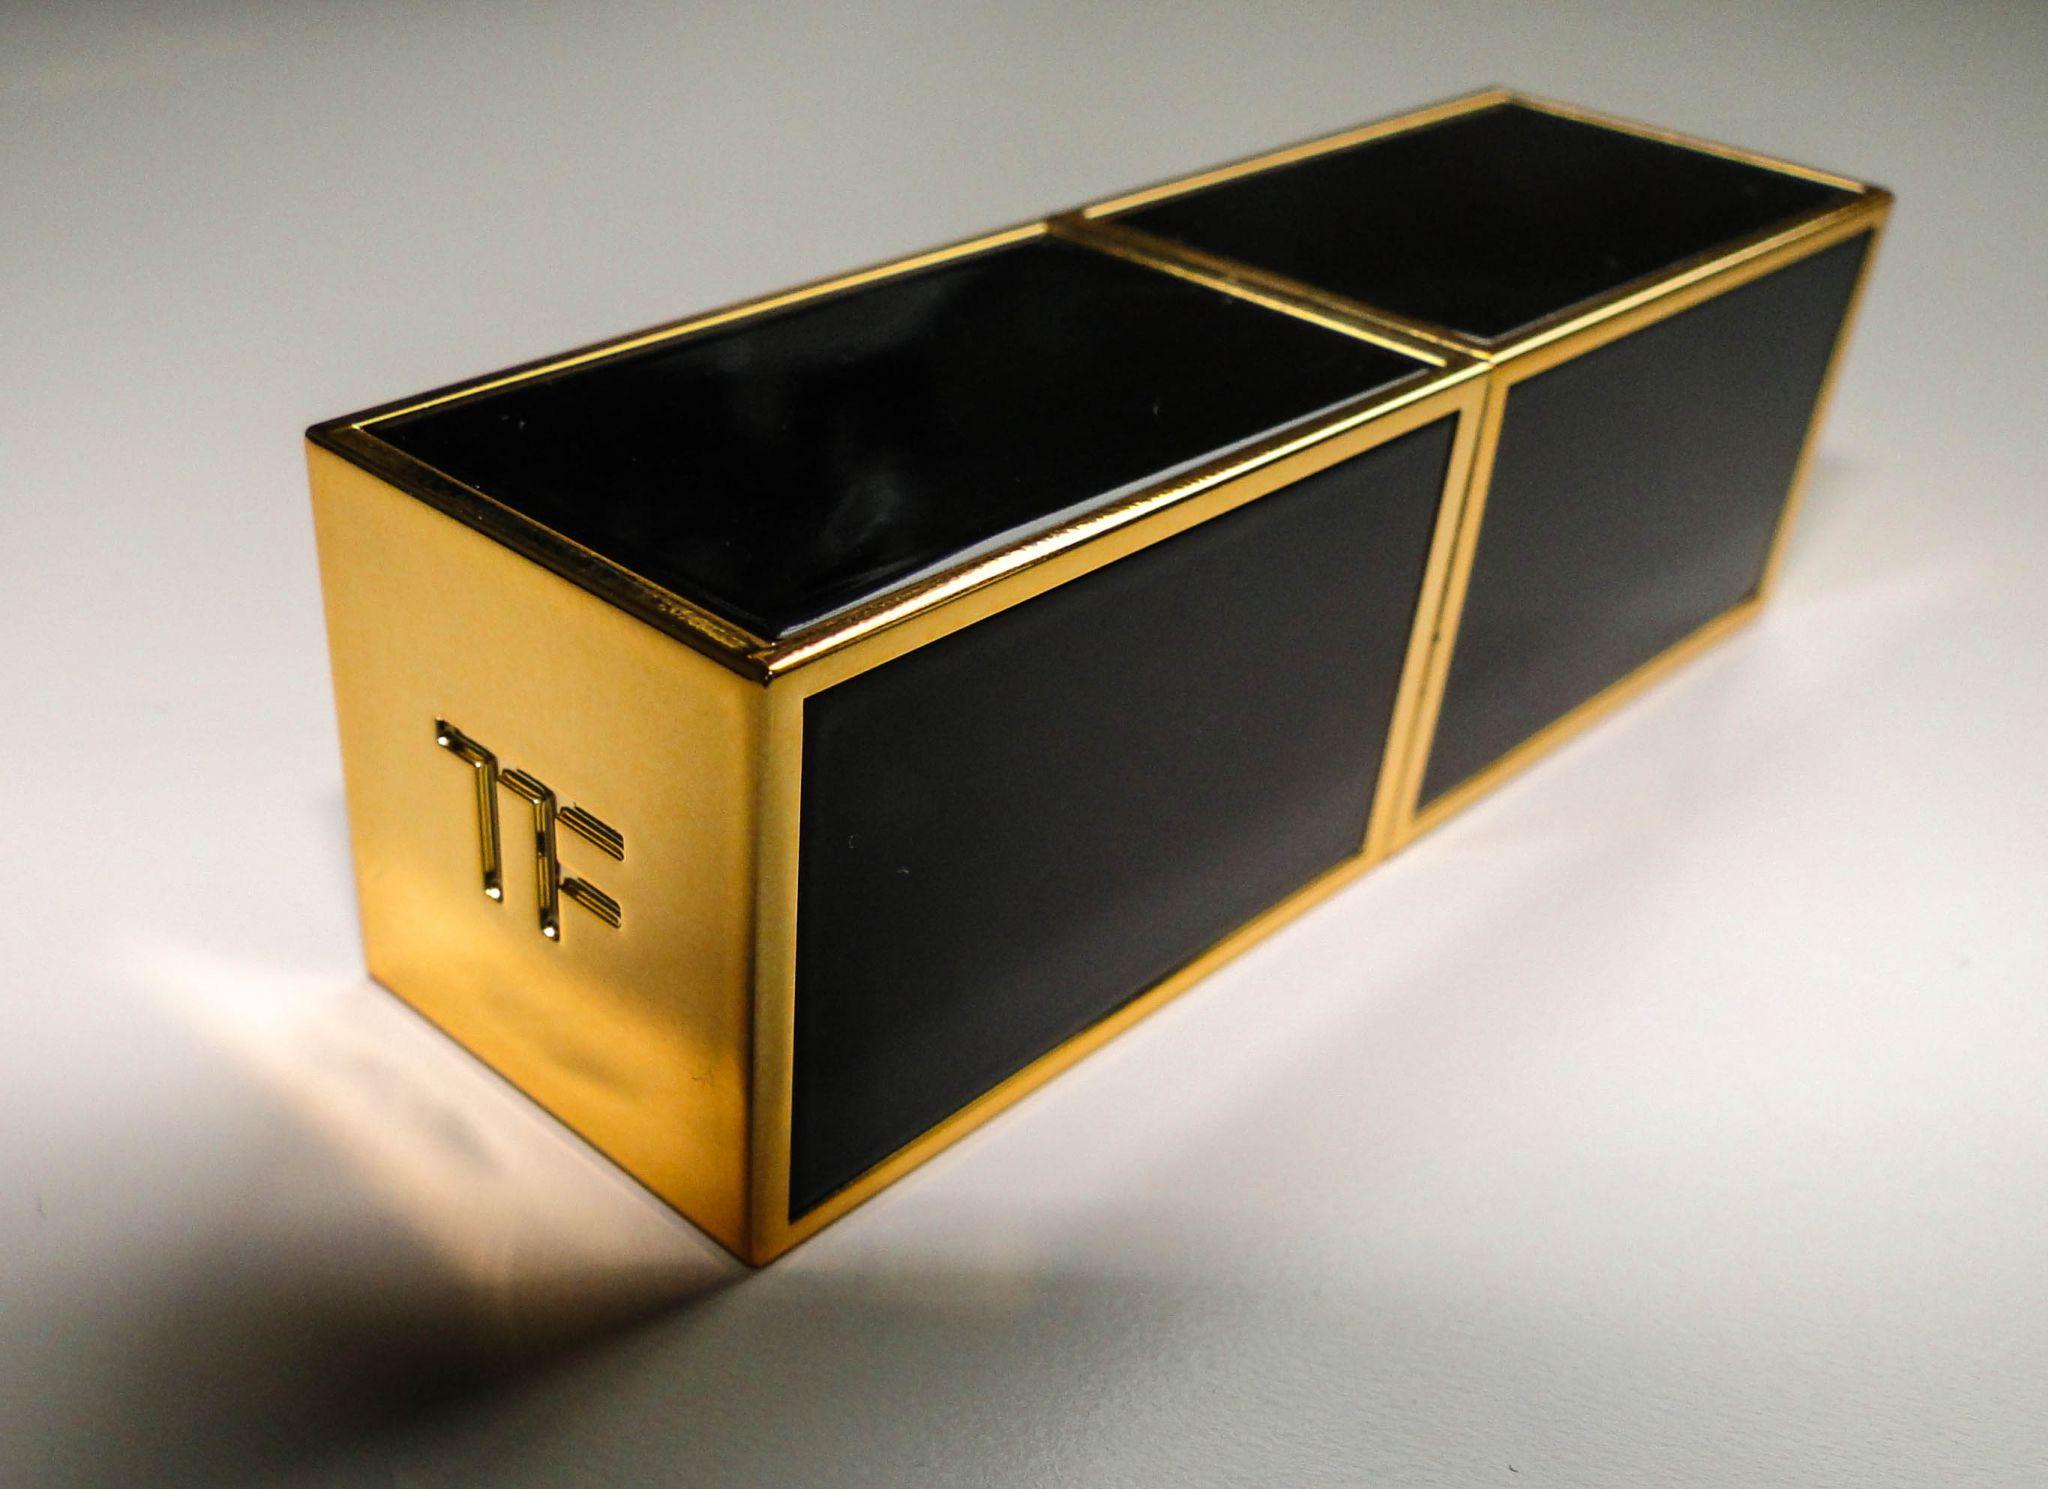 Tom Ford Lipstick - True Coral